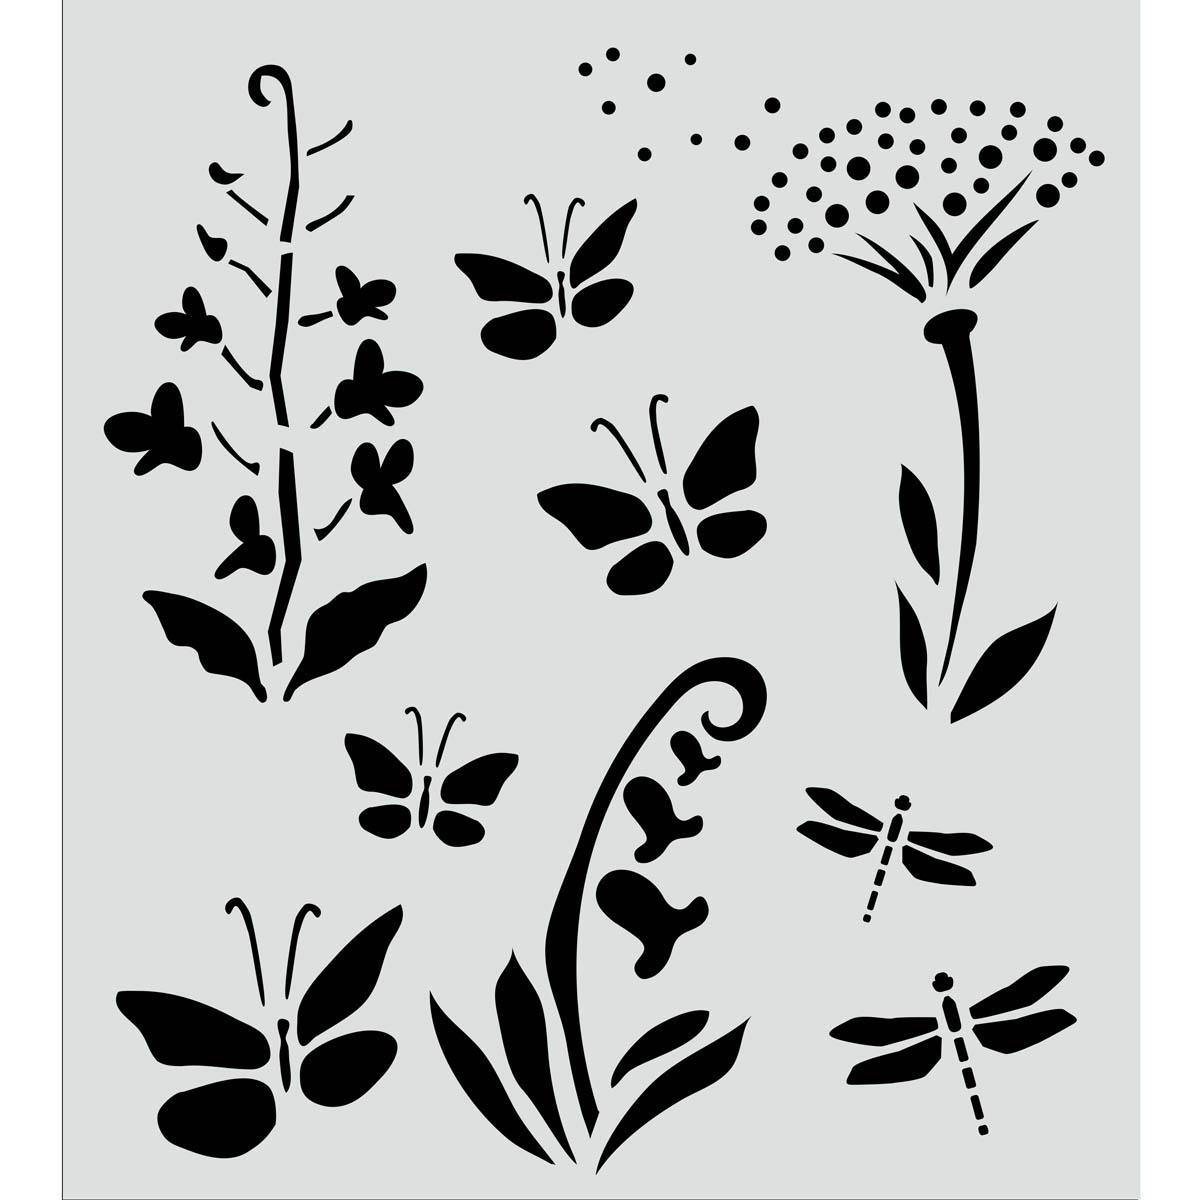 FolkArt ® Painting Stencils - Wildflowers & Butterflies